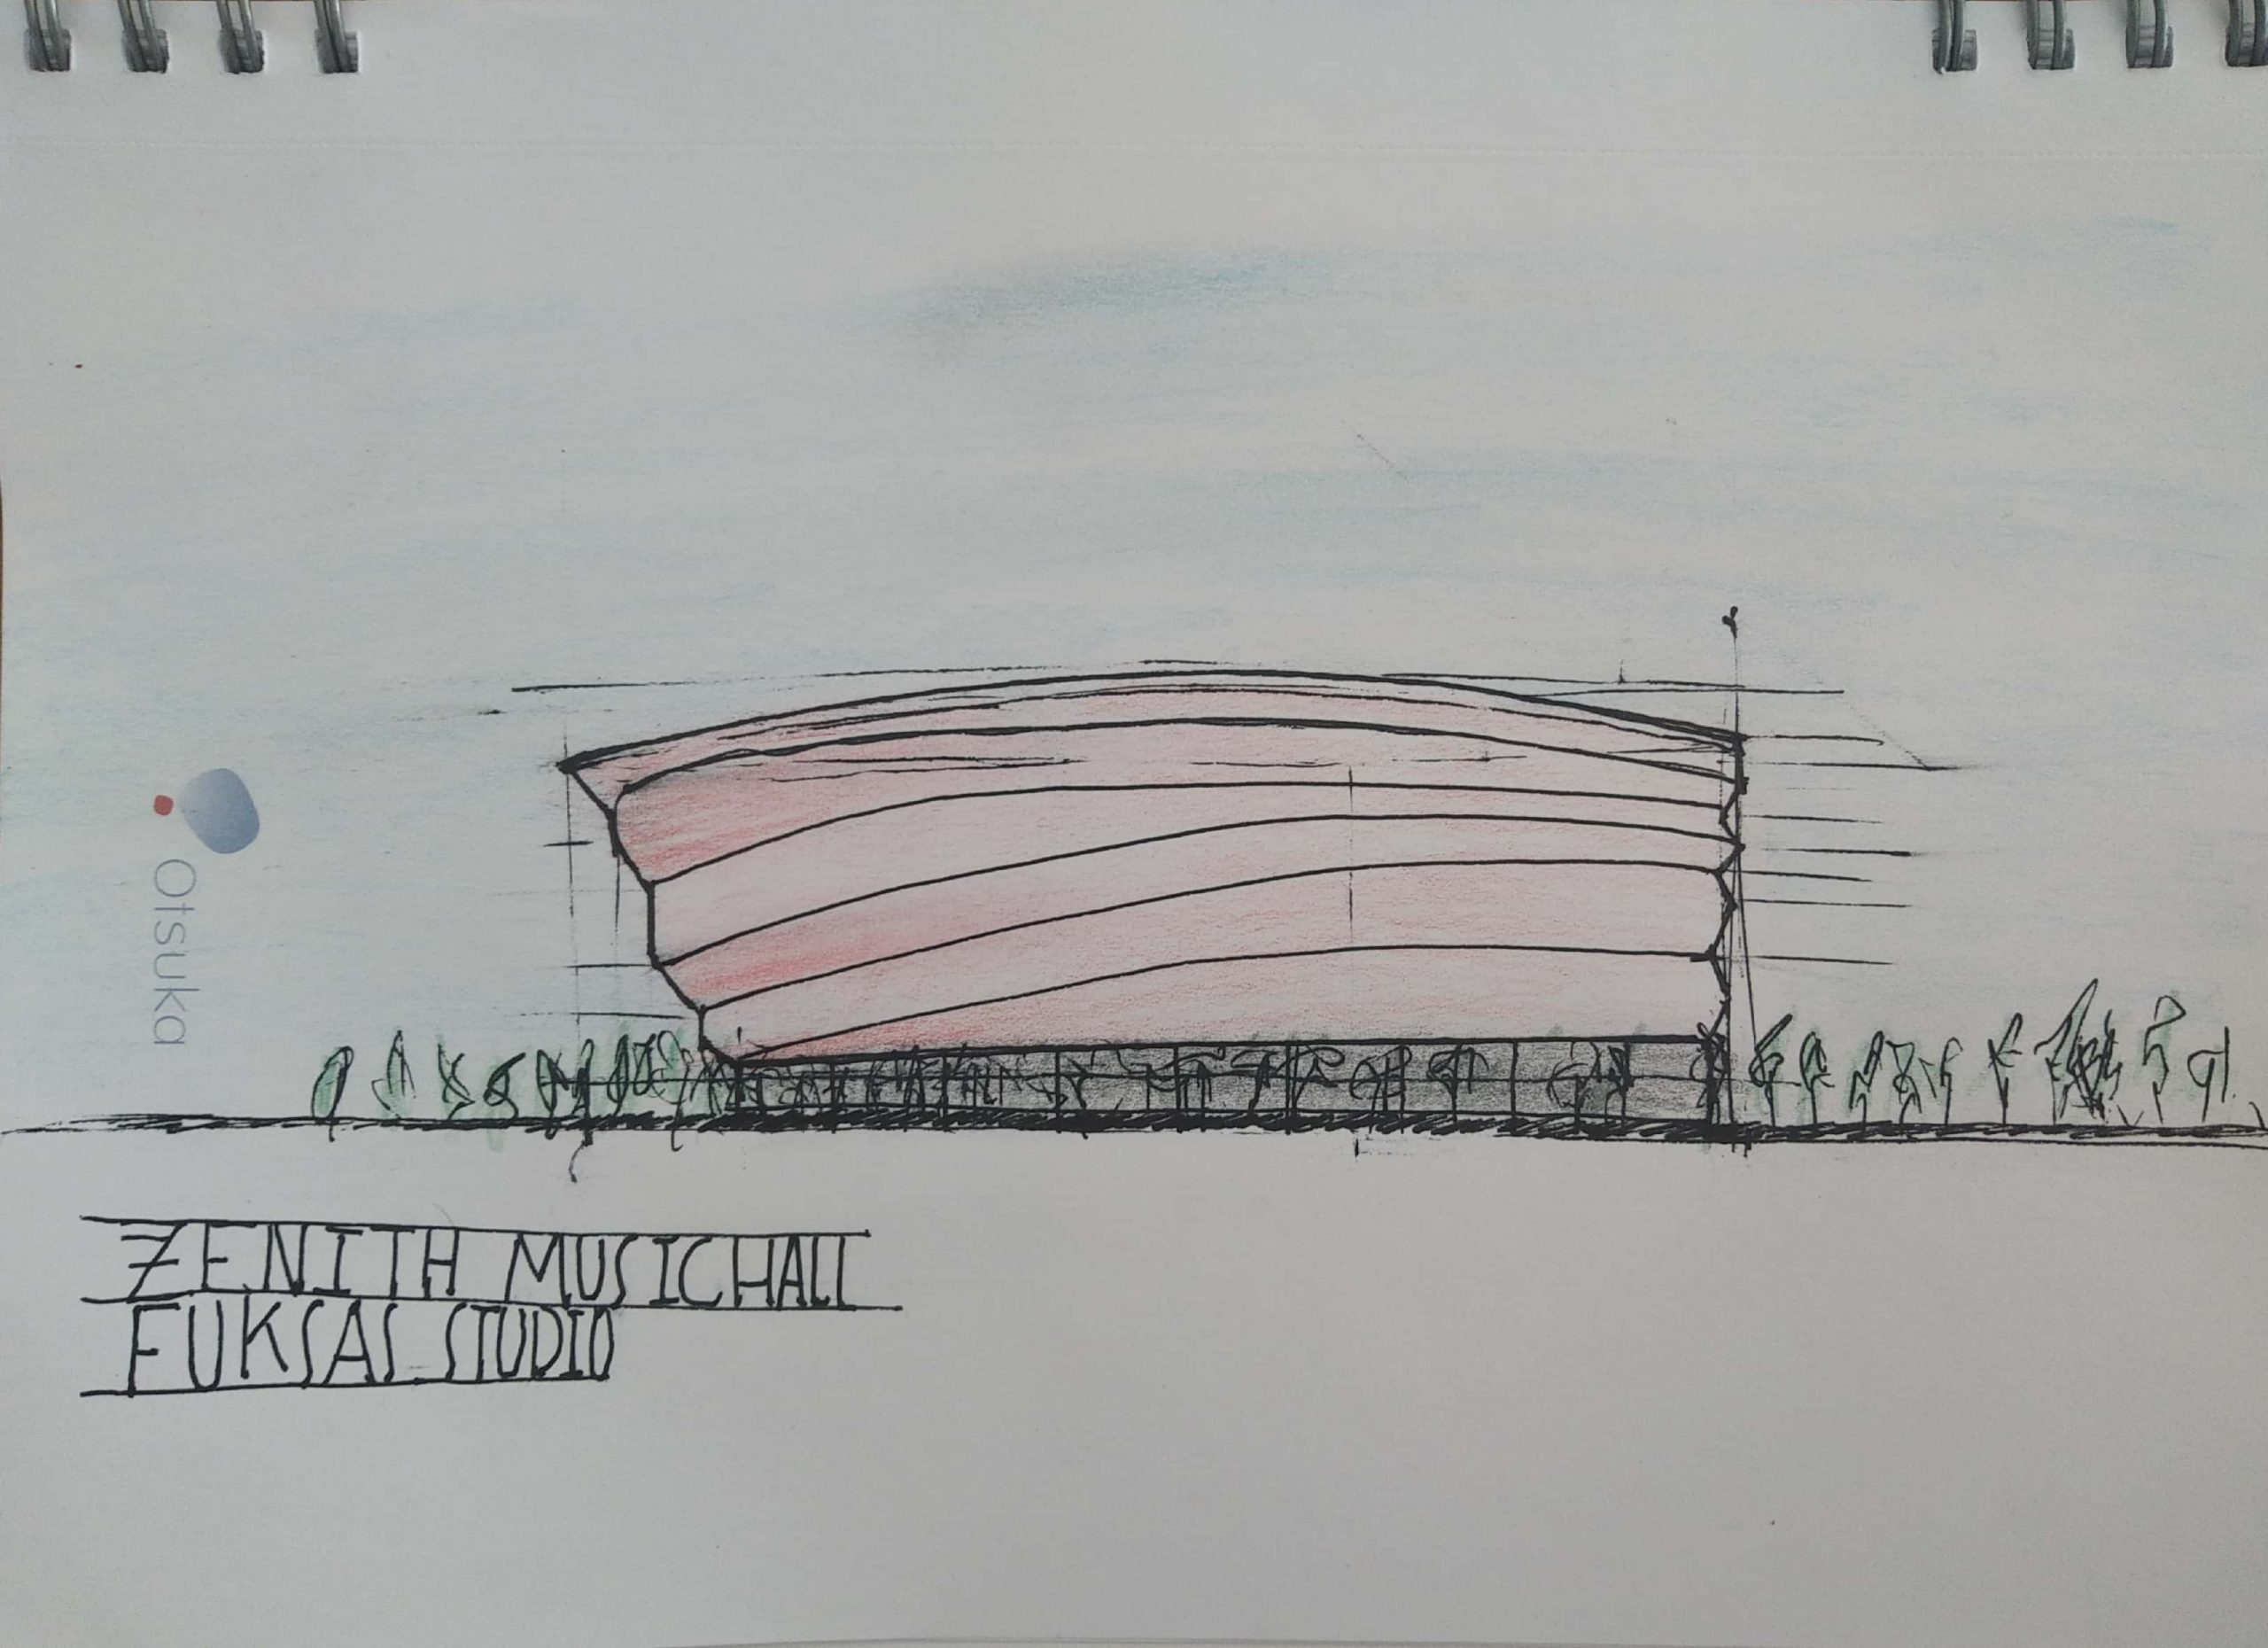 Zenith Music Hall (Fuksas)